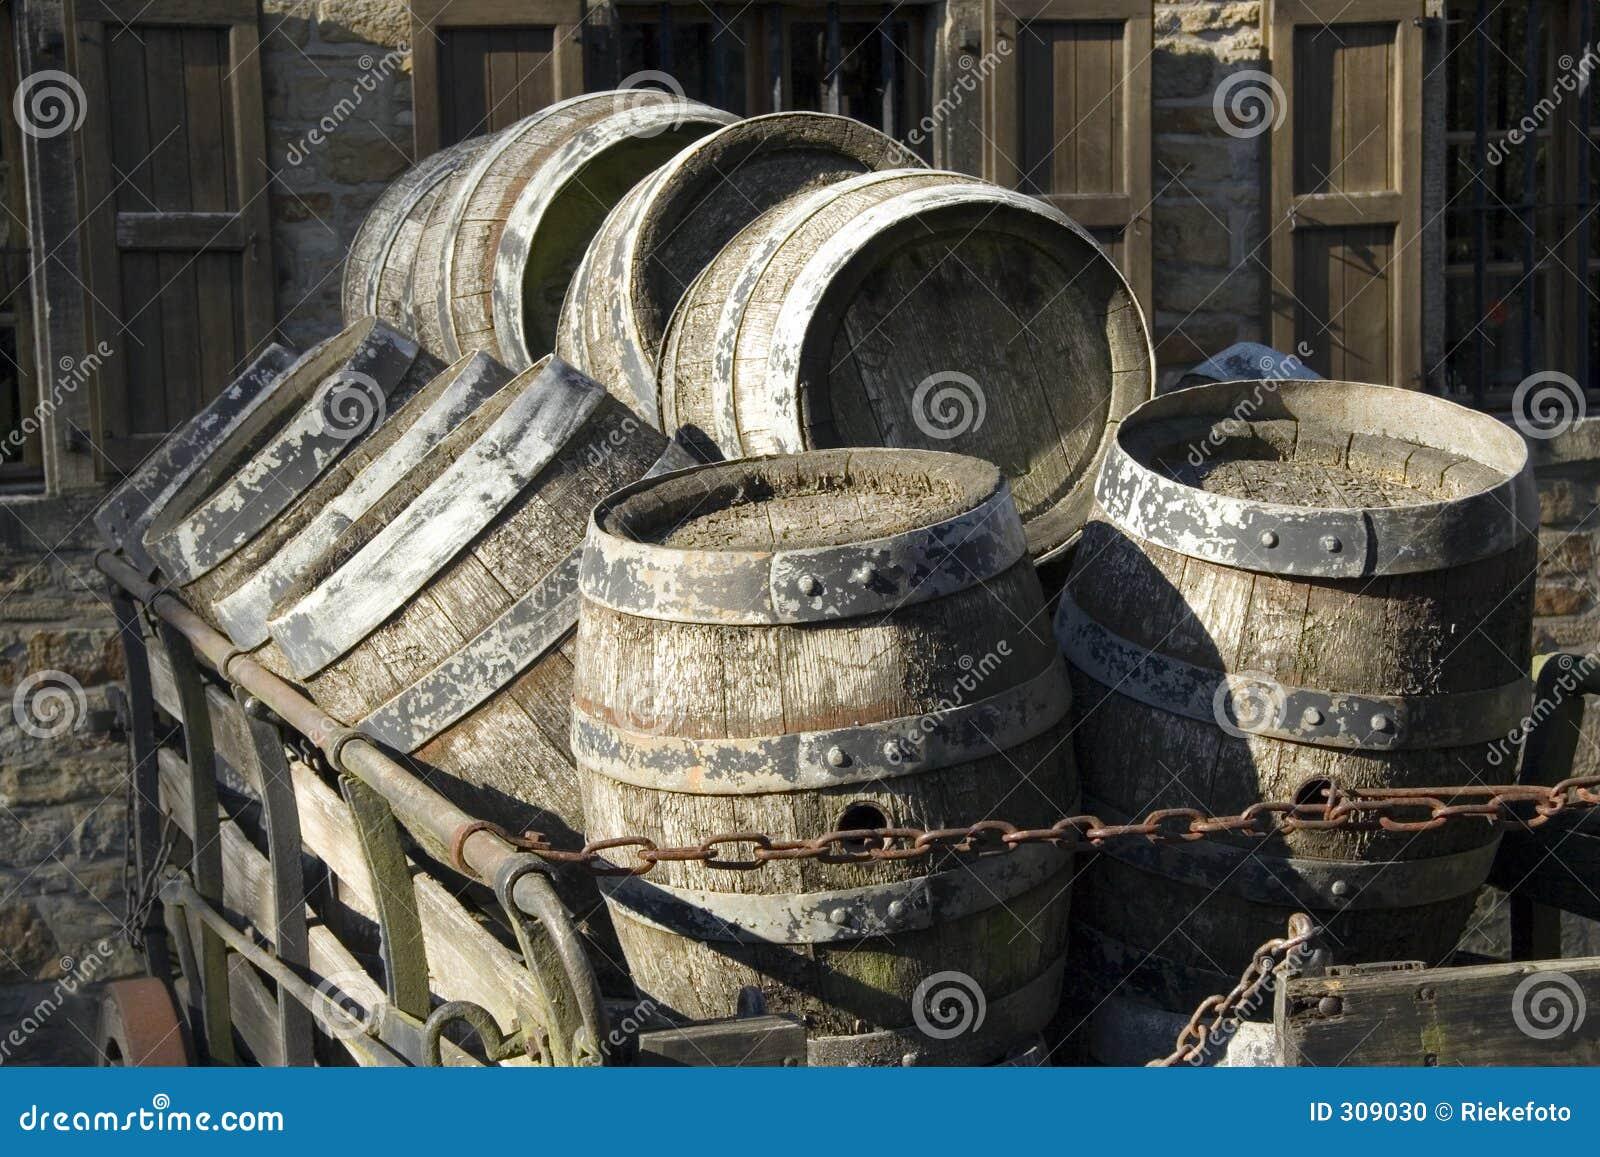 Antique beer barrels